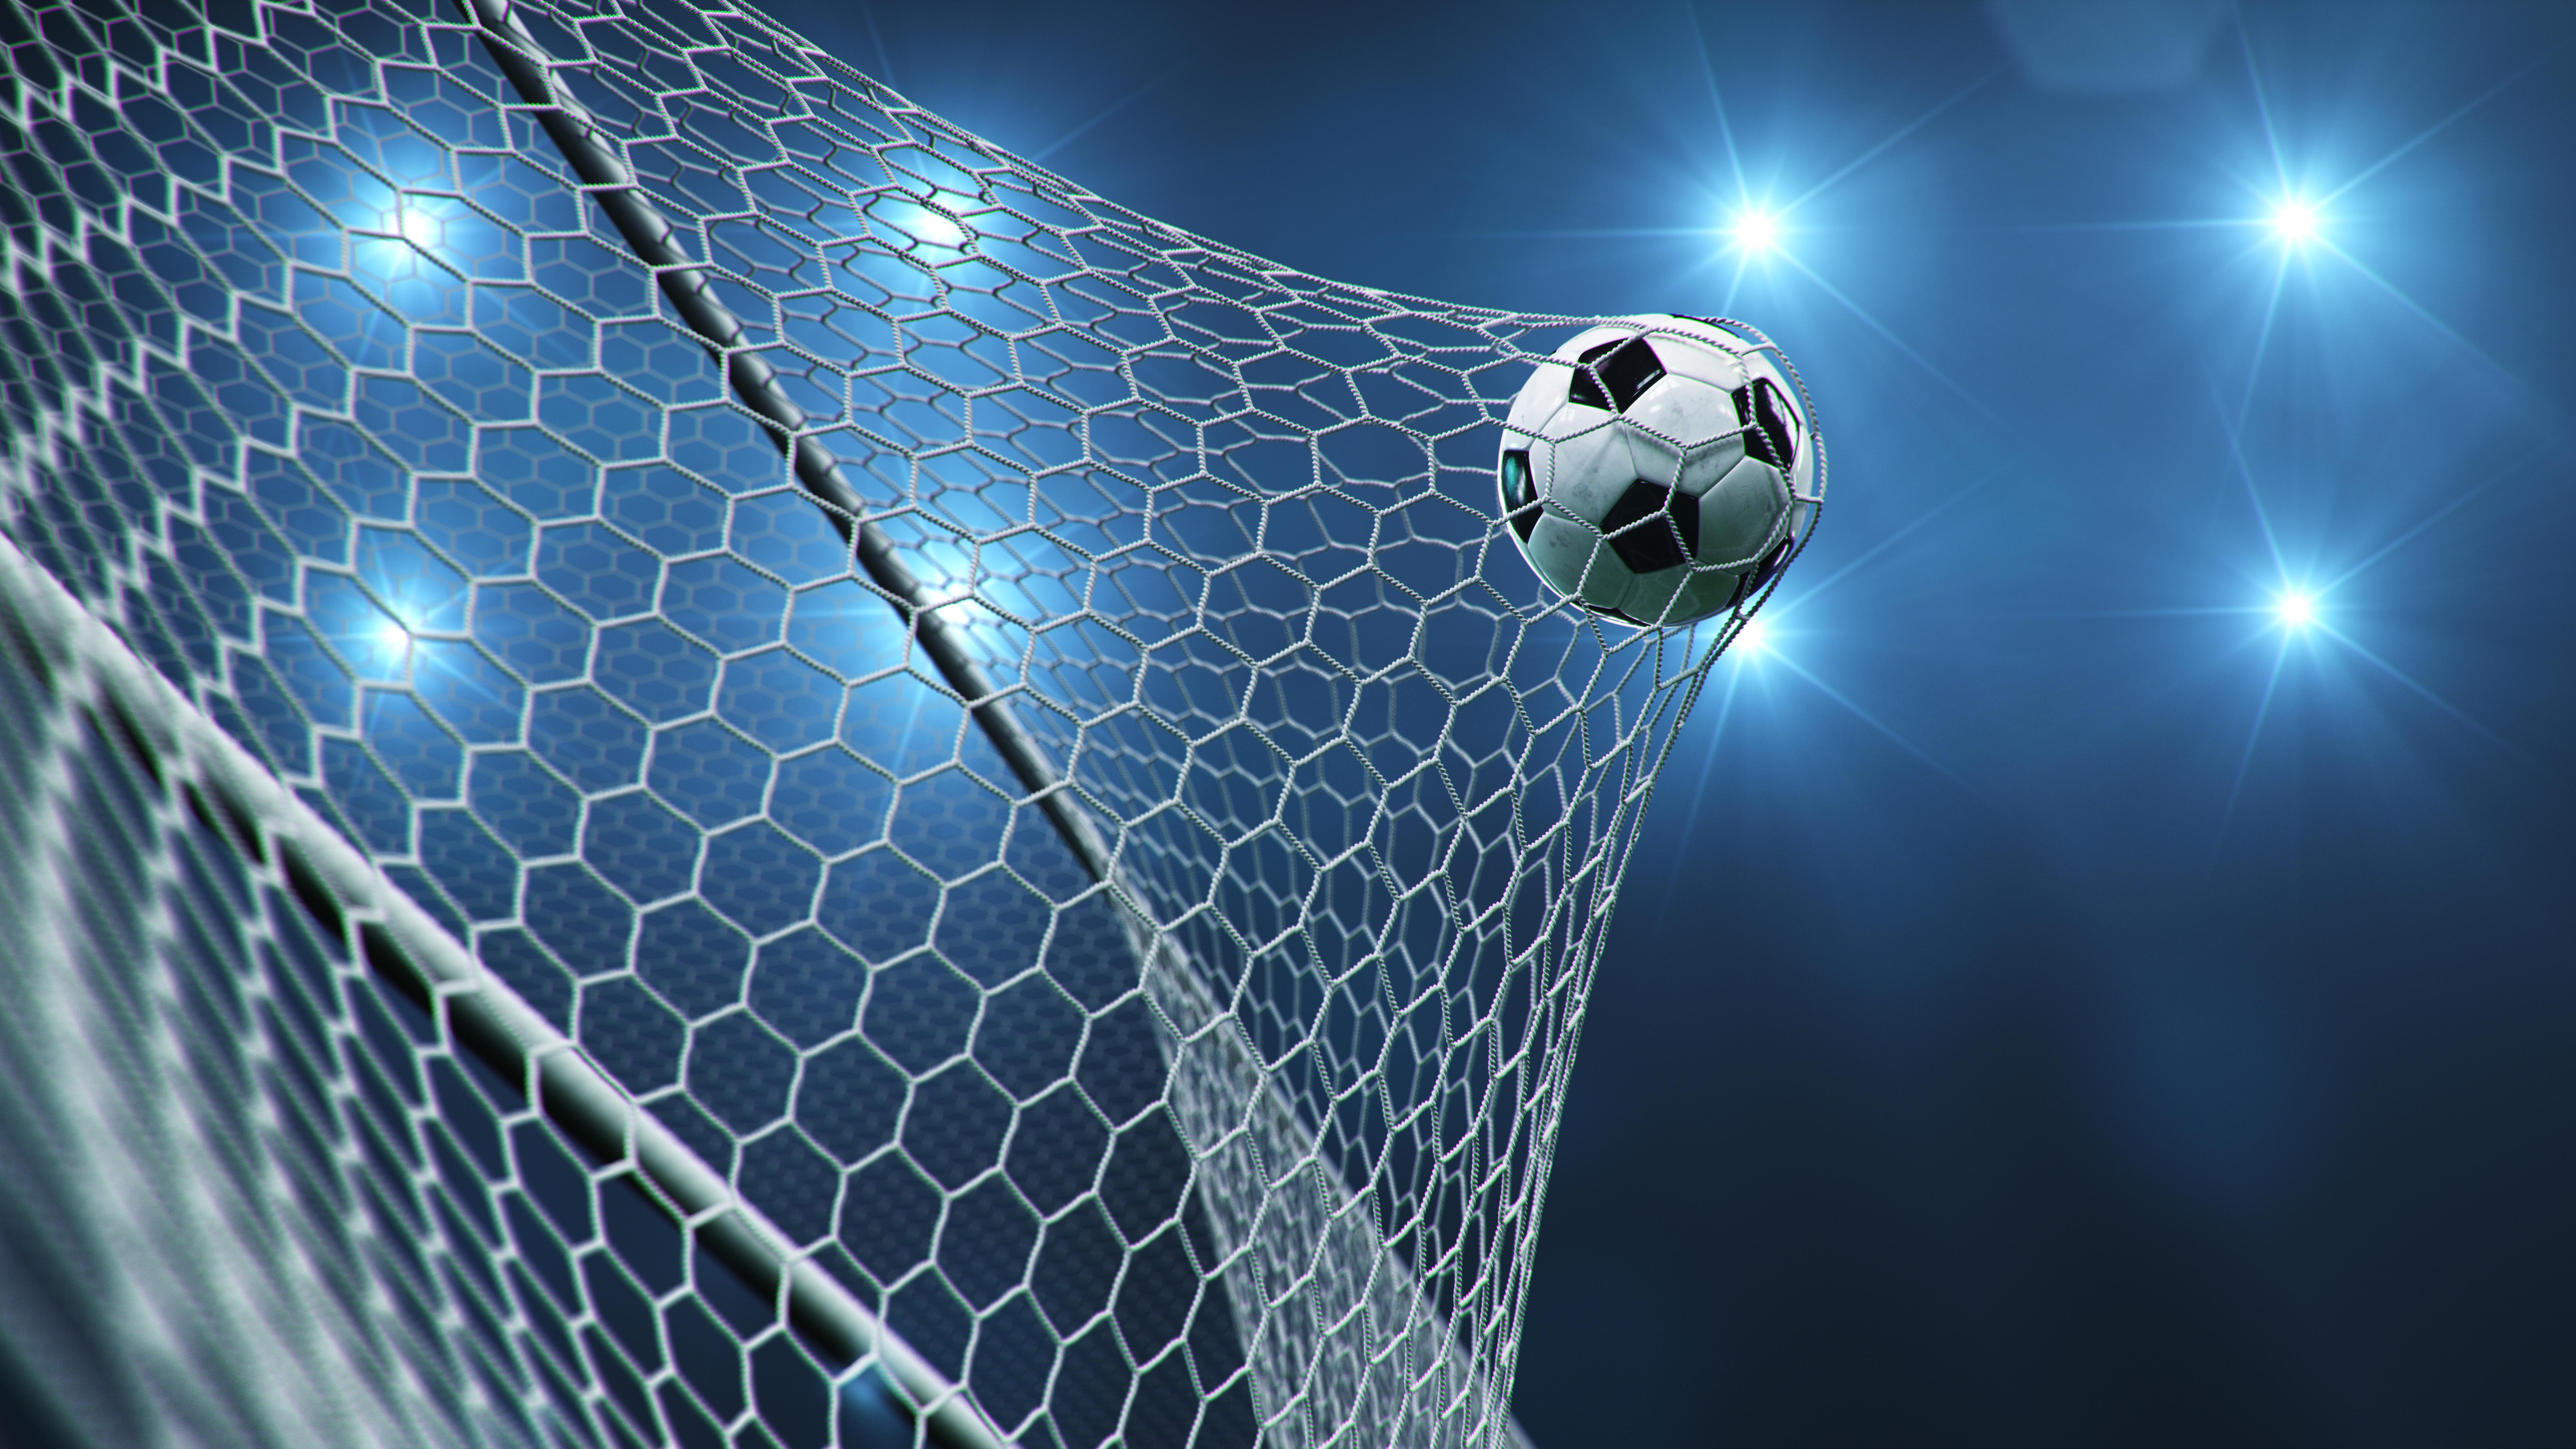 CFR Cluj s-a calificat in play-offul UEFA Europa League